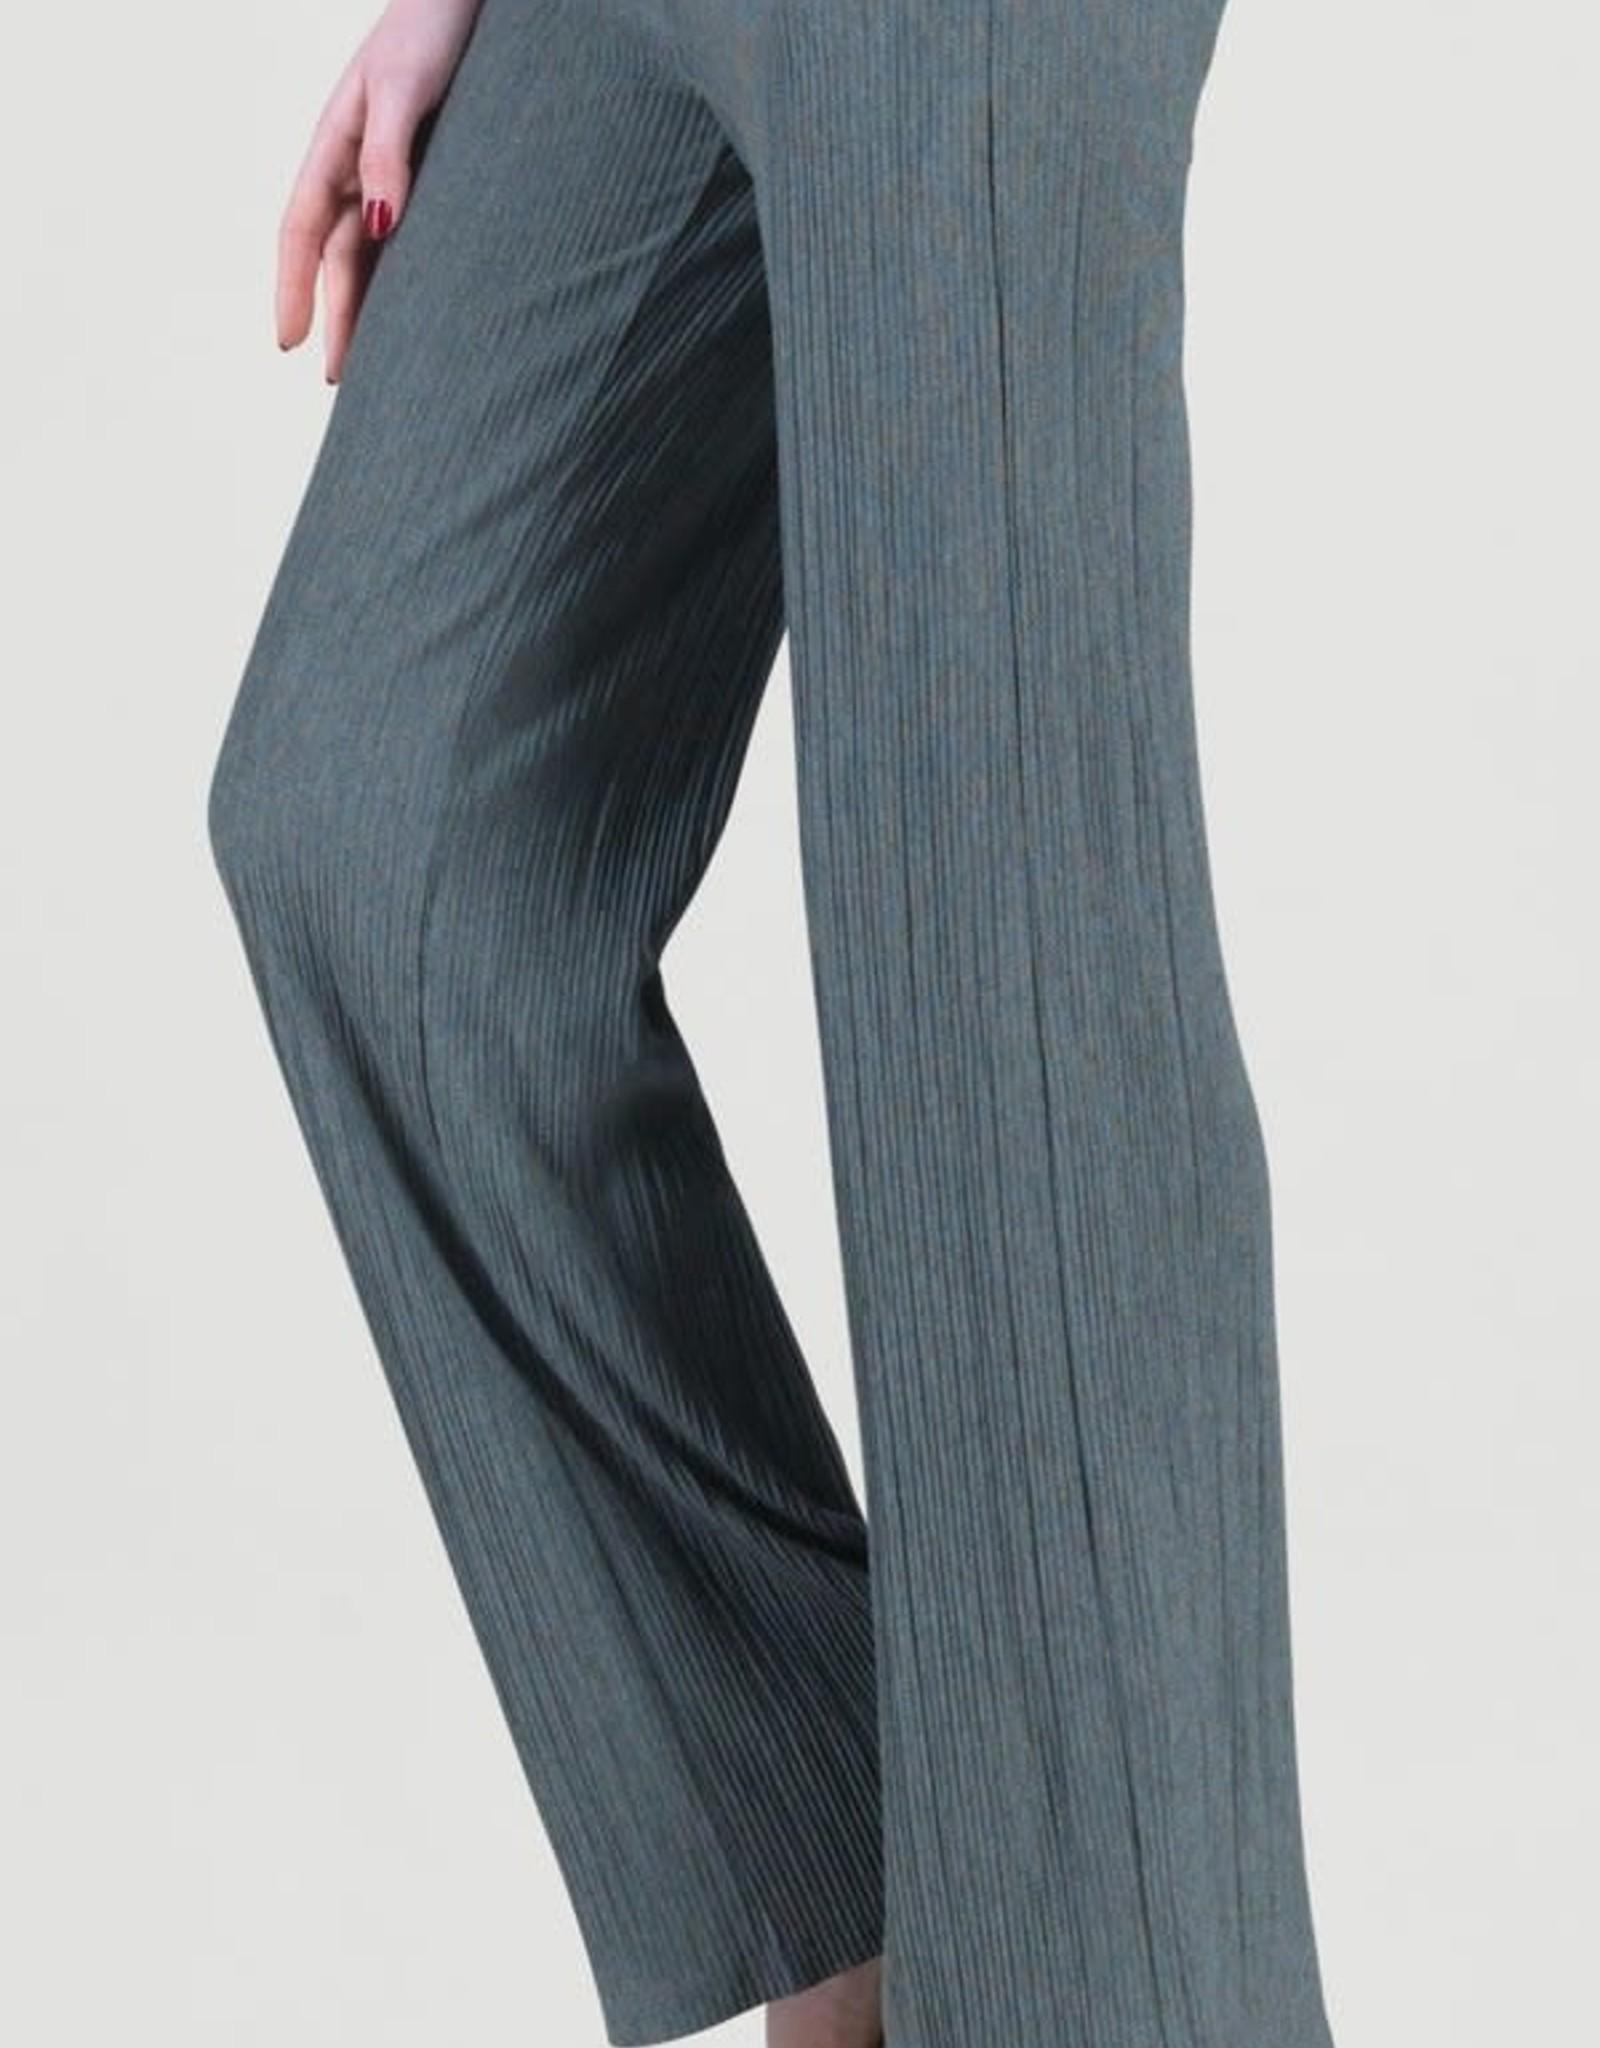 Clara Sunwoo Charcoal Pleated Soft Knit Pull-On Pant